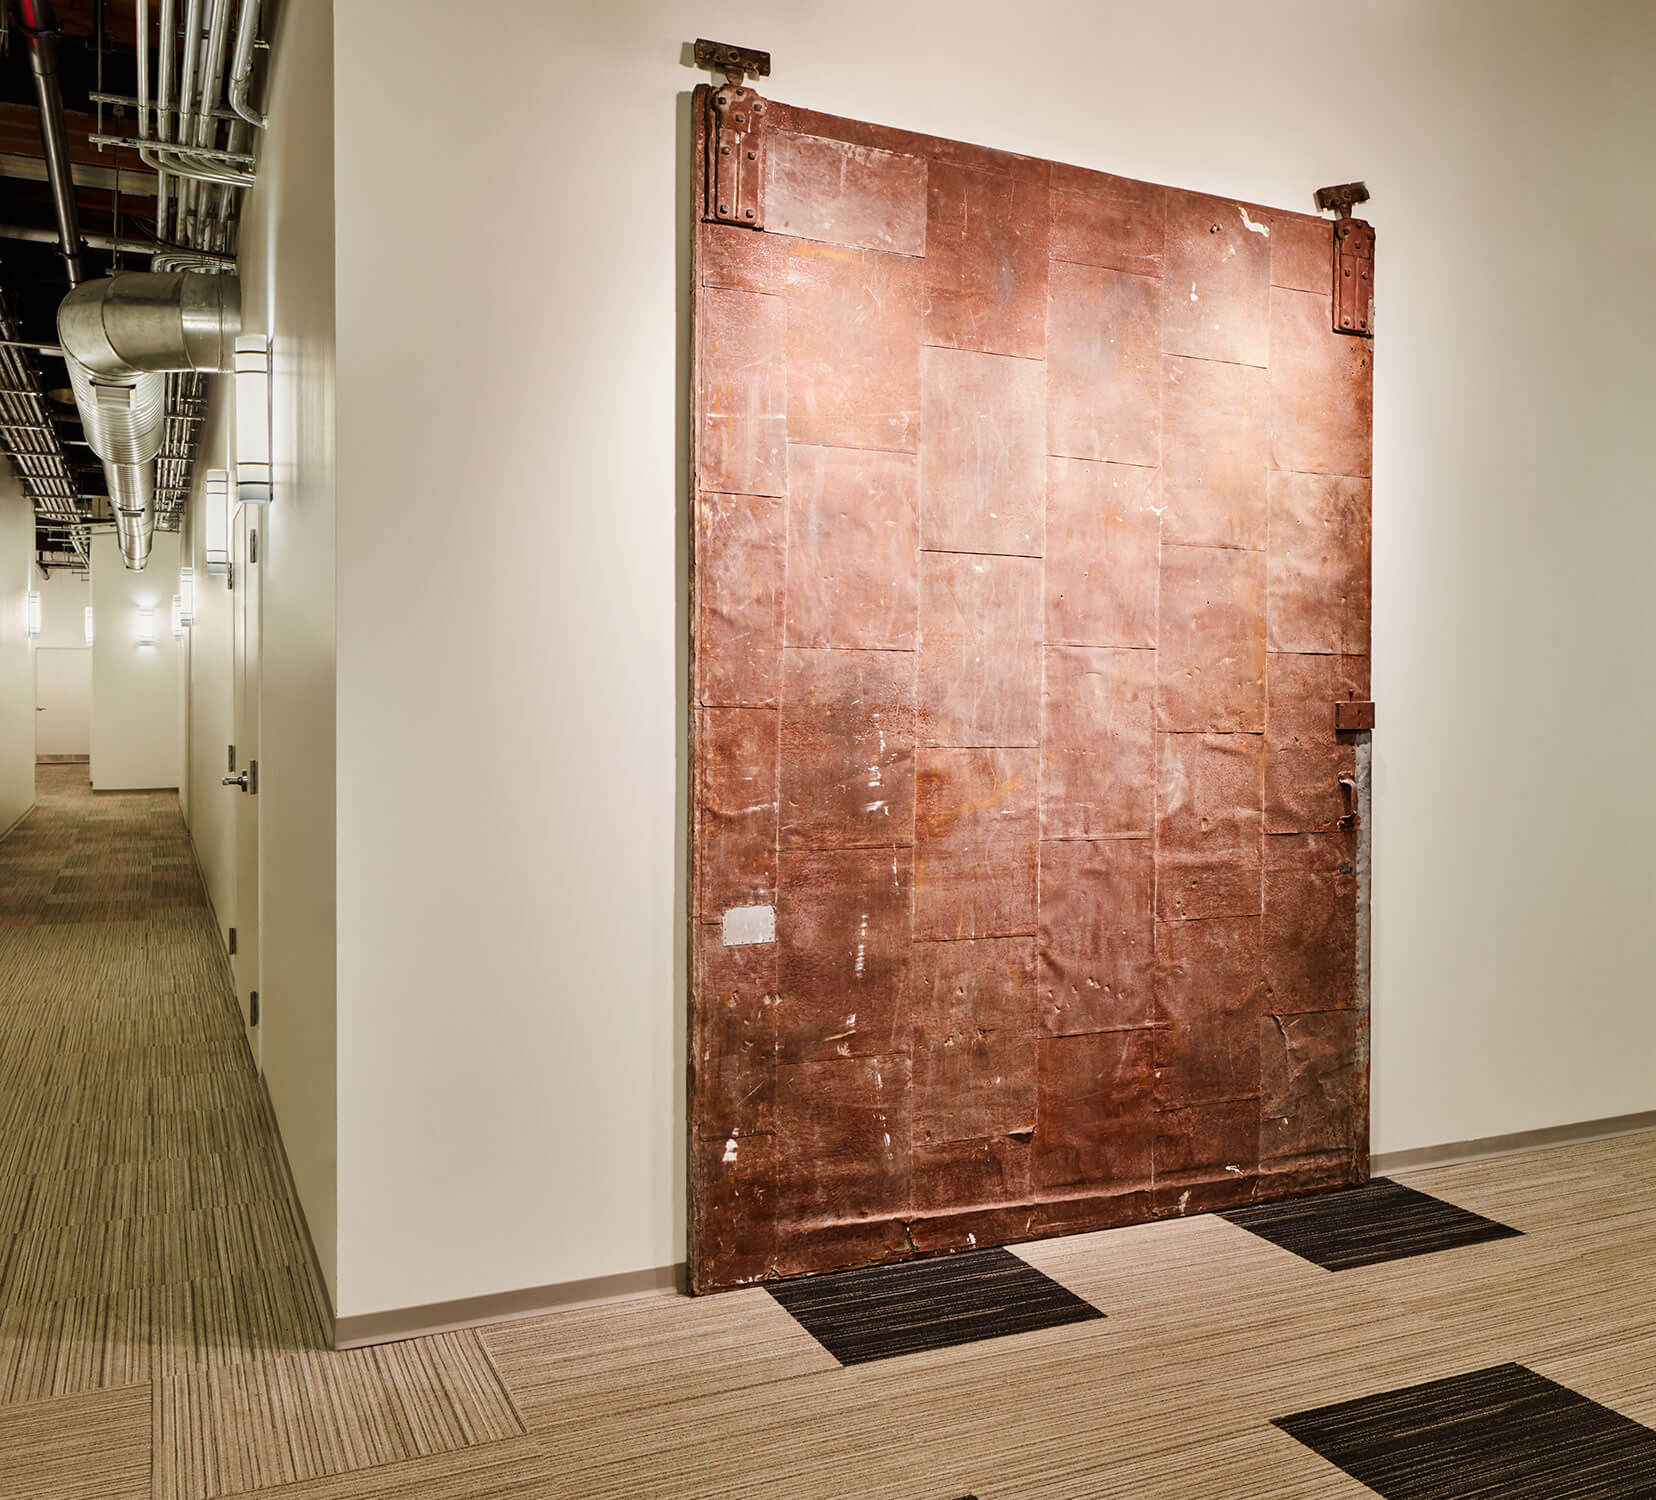 Copper door detail in a white hallway.